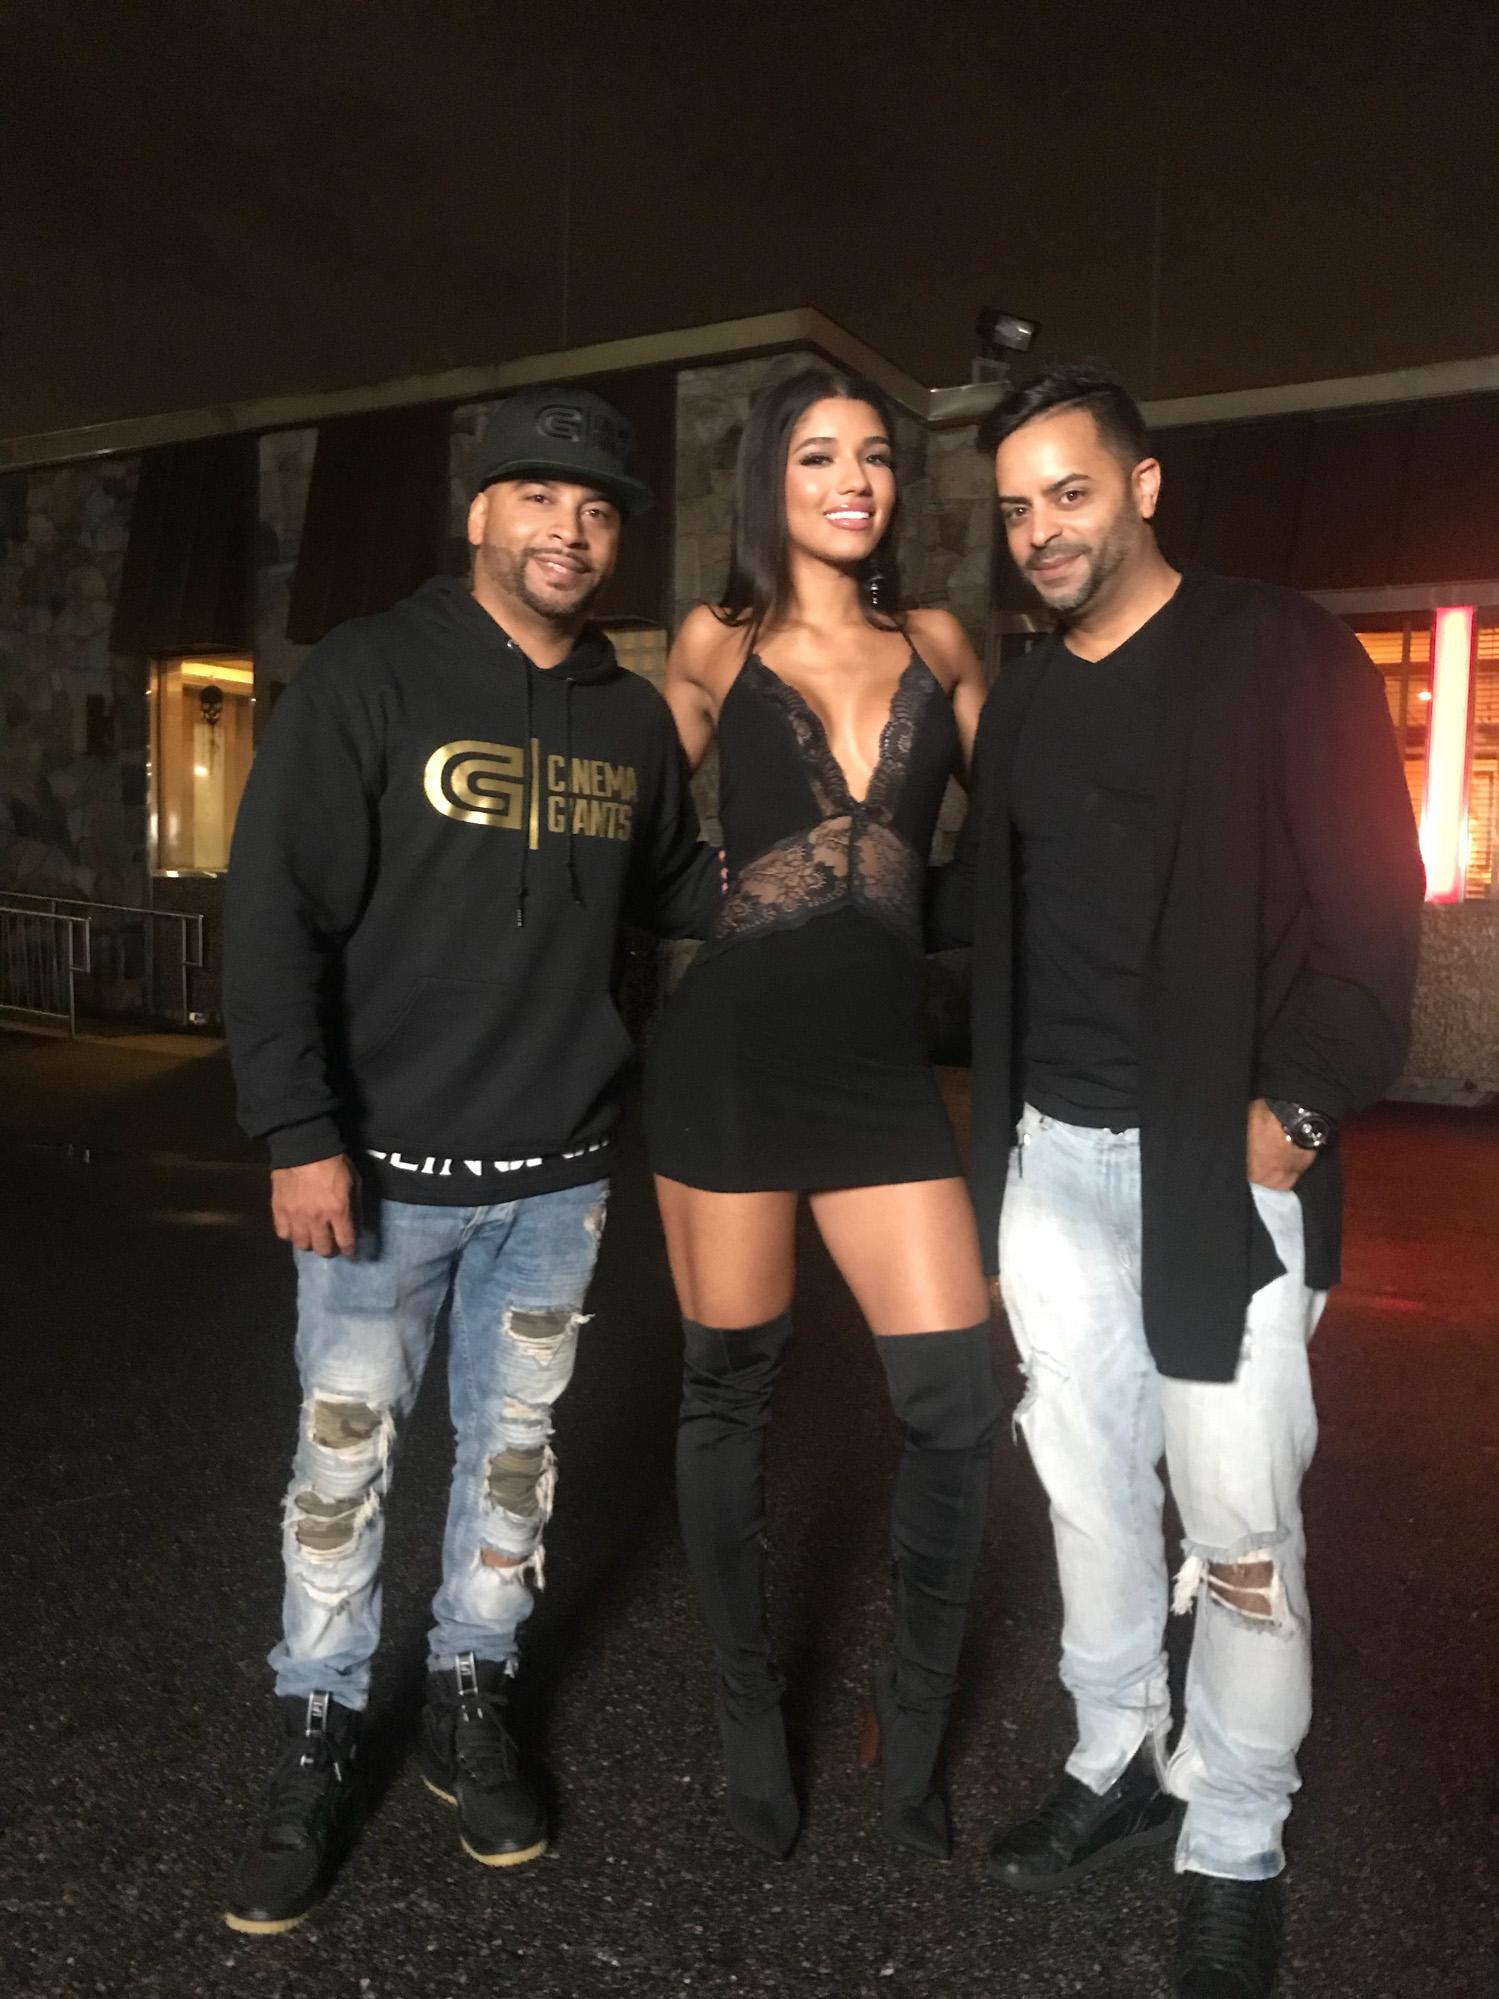 Yovanna Ventura, Jessy Terrero and Ulysses Terrero on set of Bella y Sensual music video shot in New York City